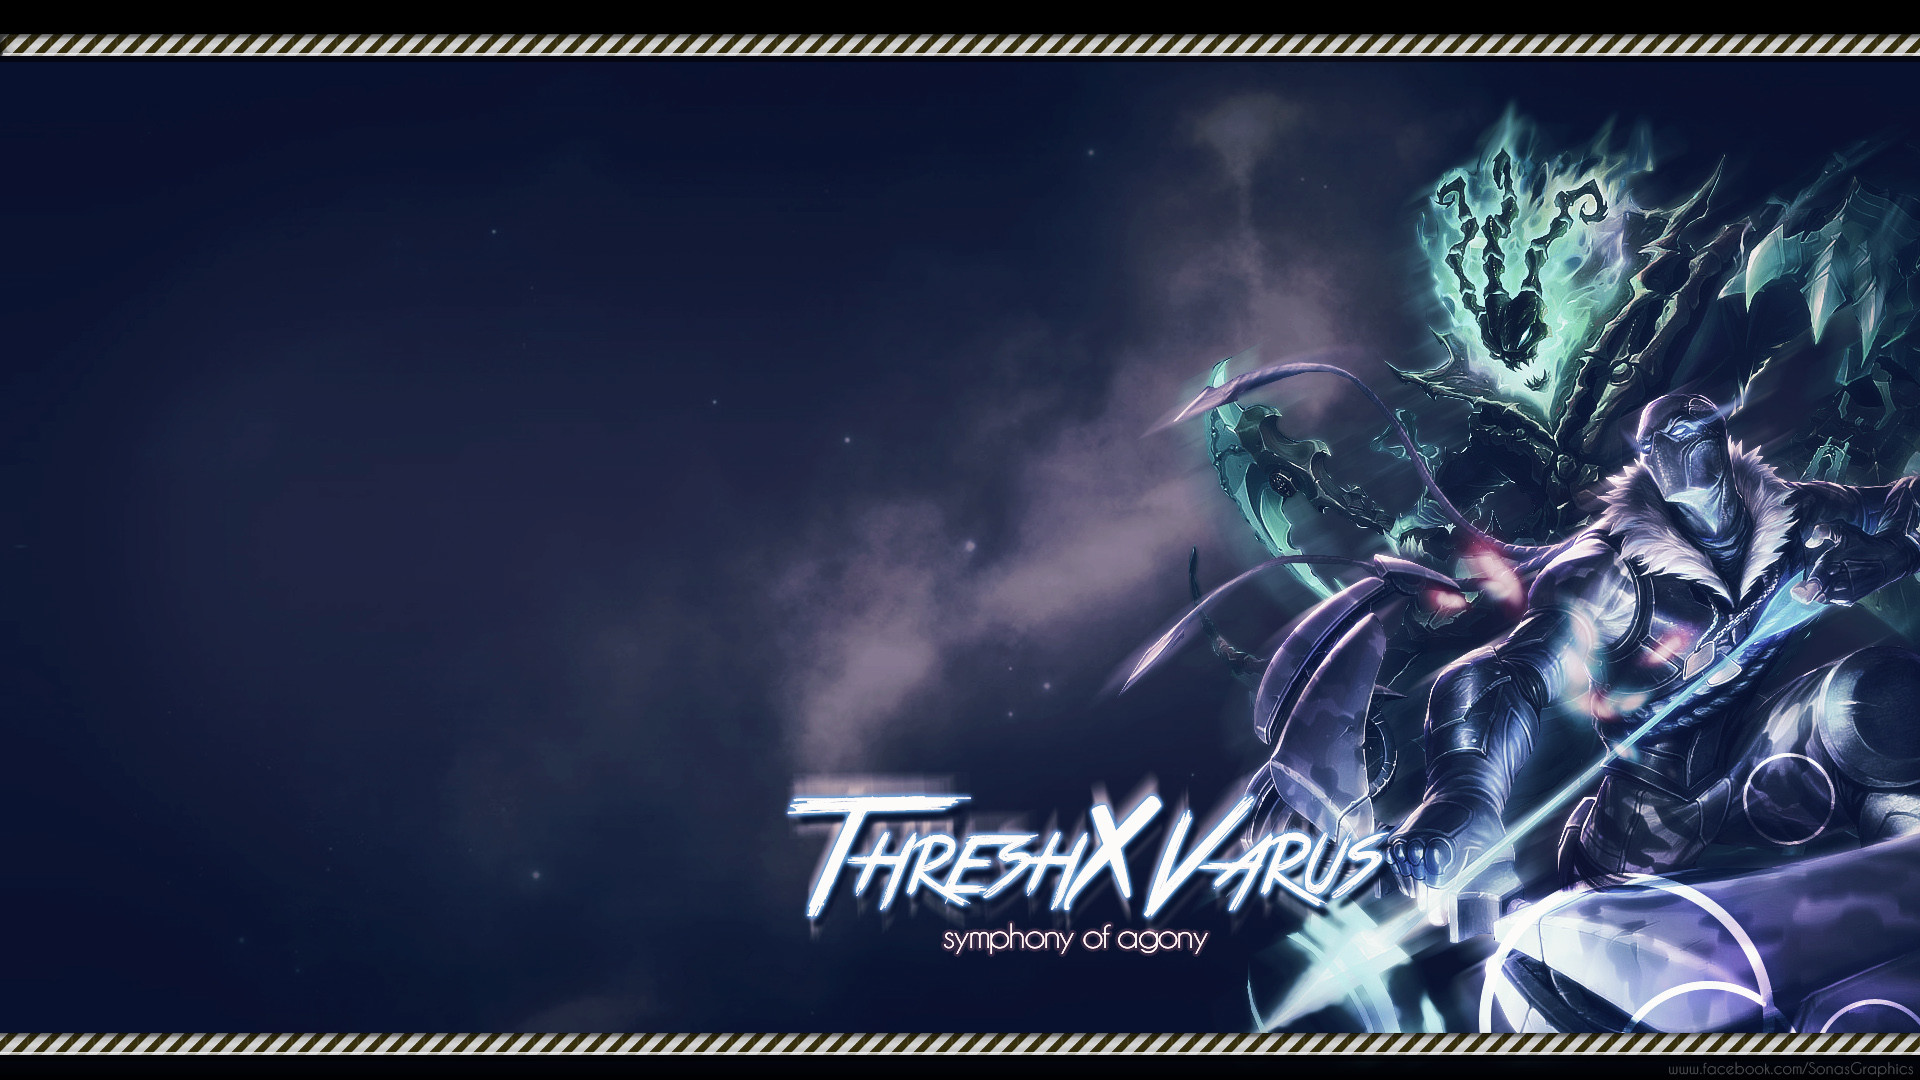 Thresh & Varus by SonasGraphics HD Wallpaper Fan Art Artwork League of  Legends lol